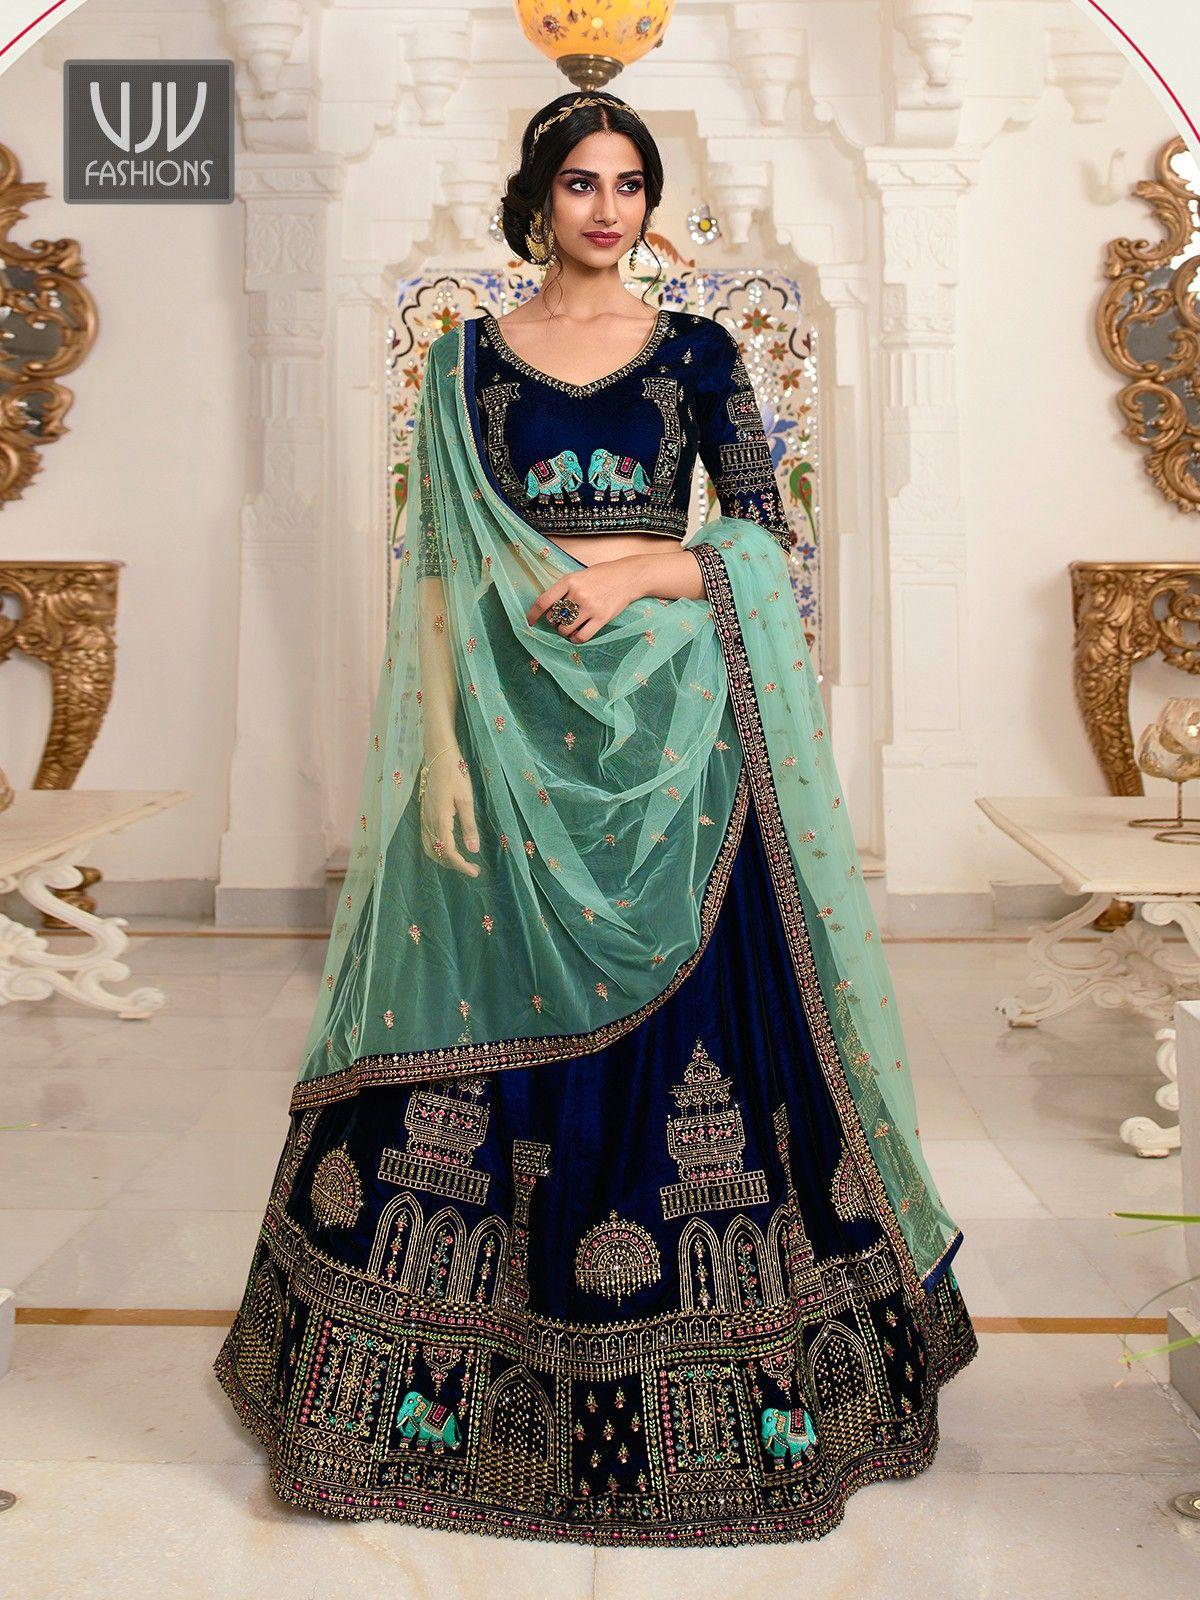 Wondrous Blue Color Fancy Fabric Lehenga Choli in 2020 ...